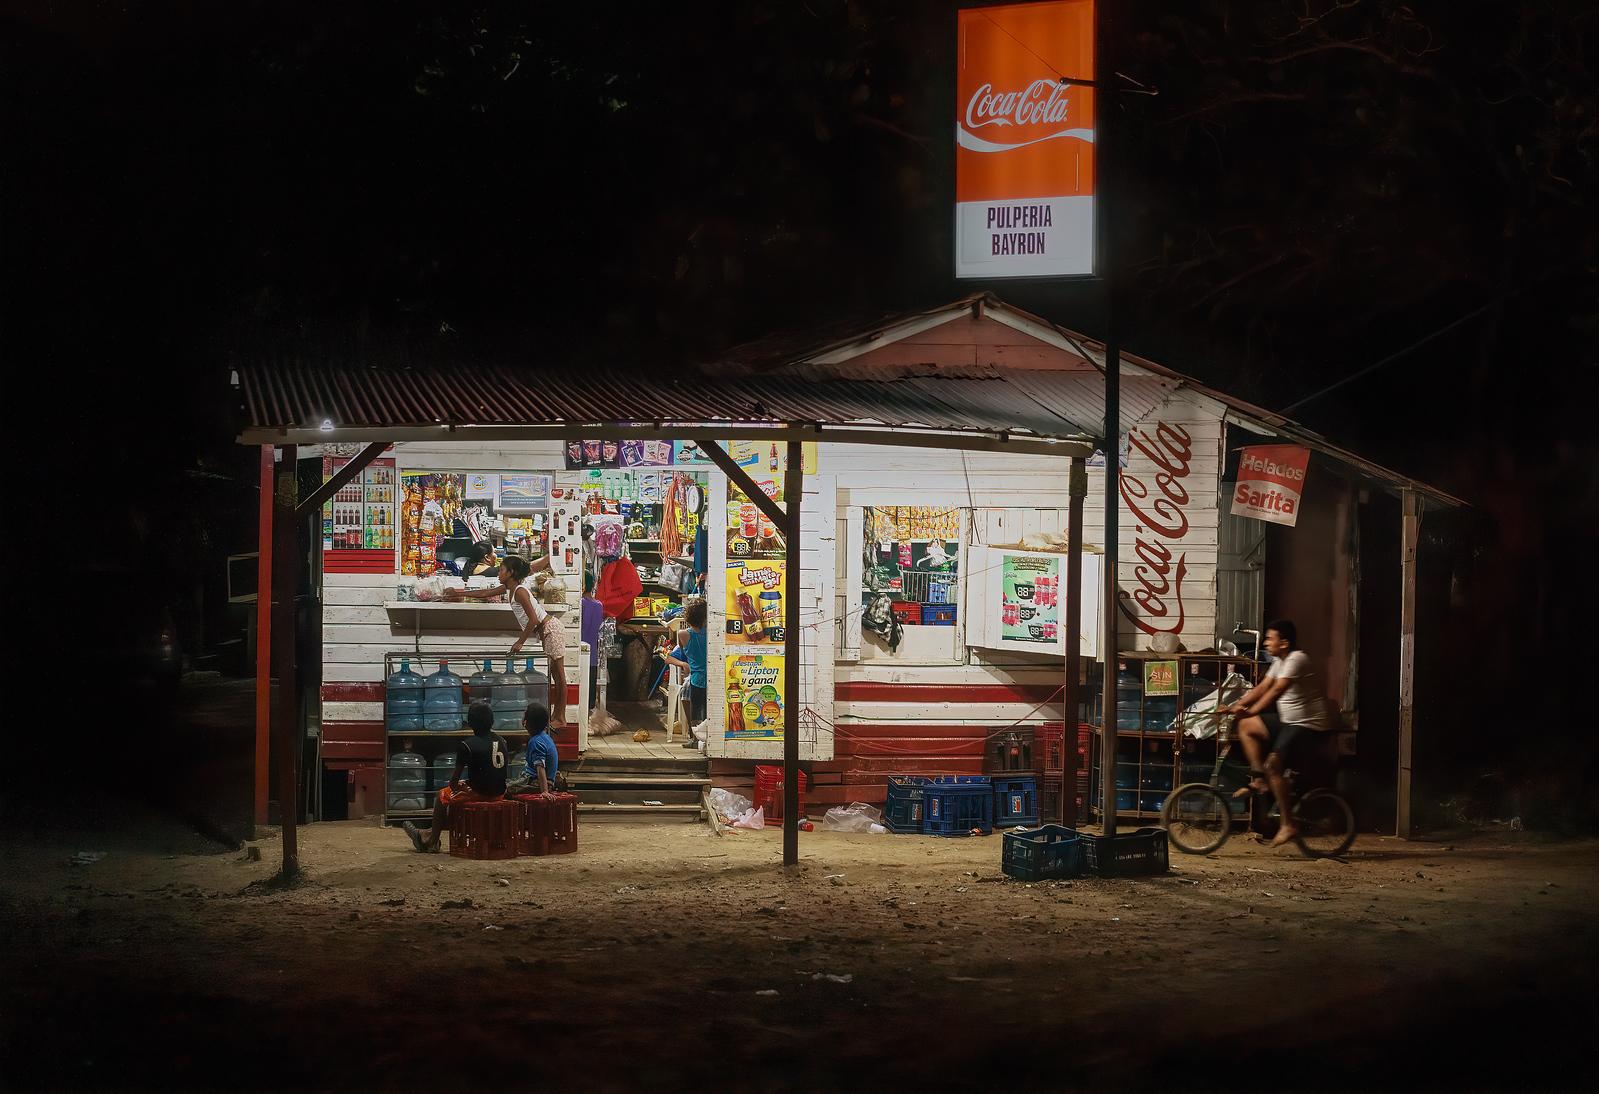 Late night snack run to the Coke stand in Roatan Honduras #intentionallylost